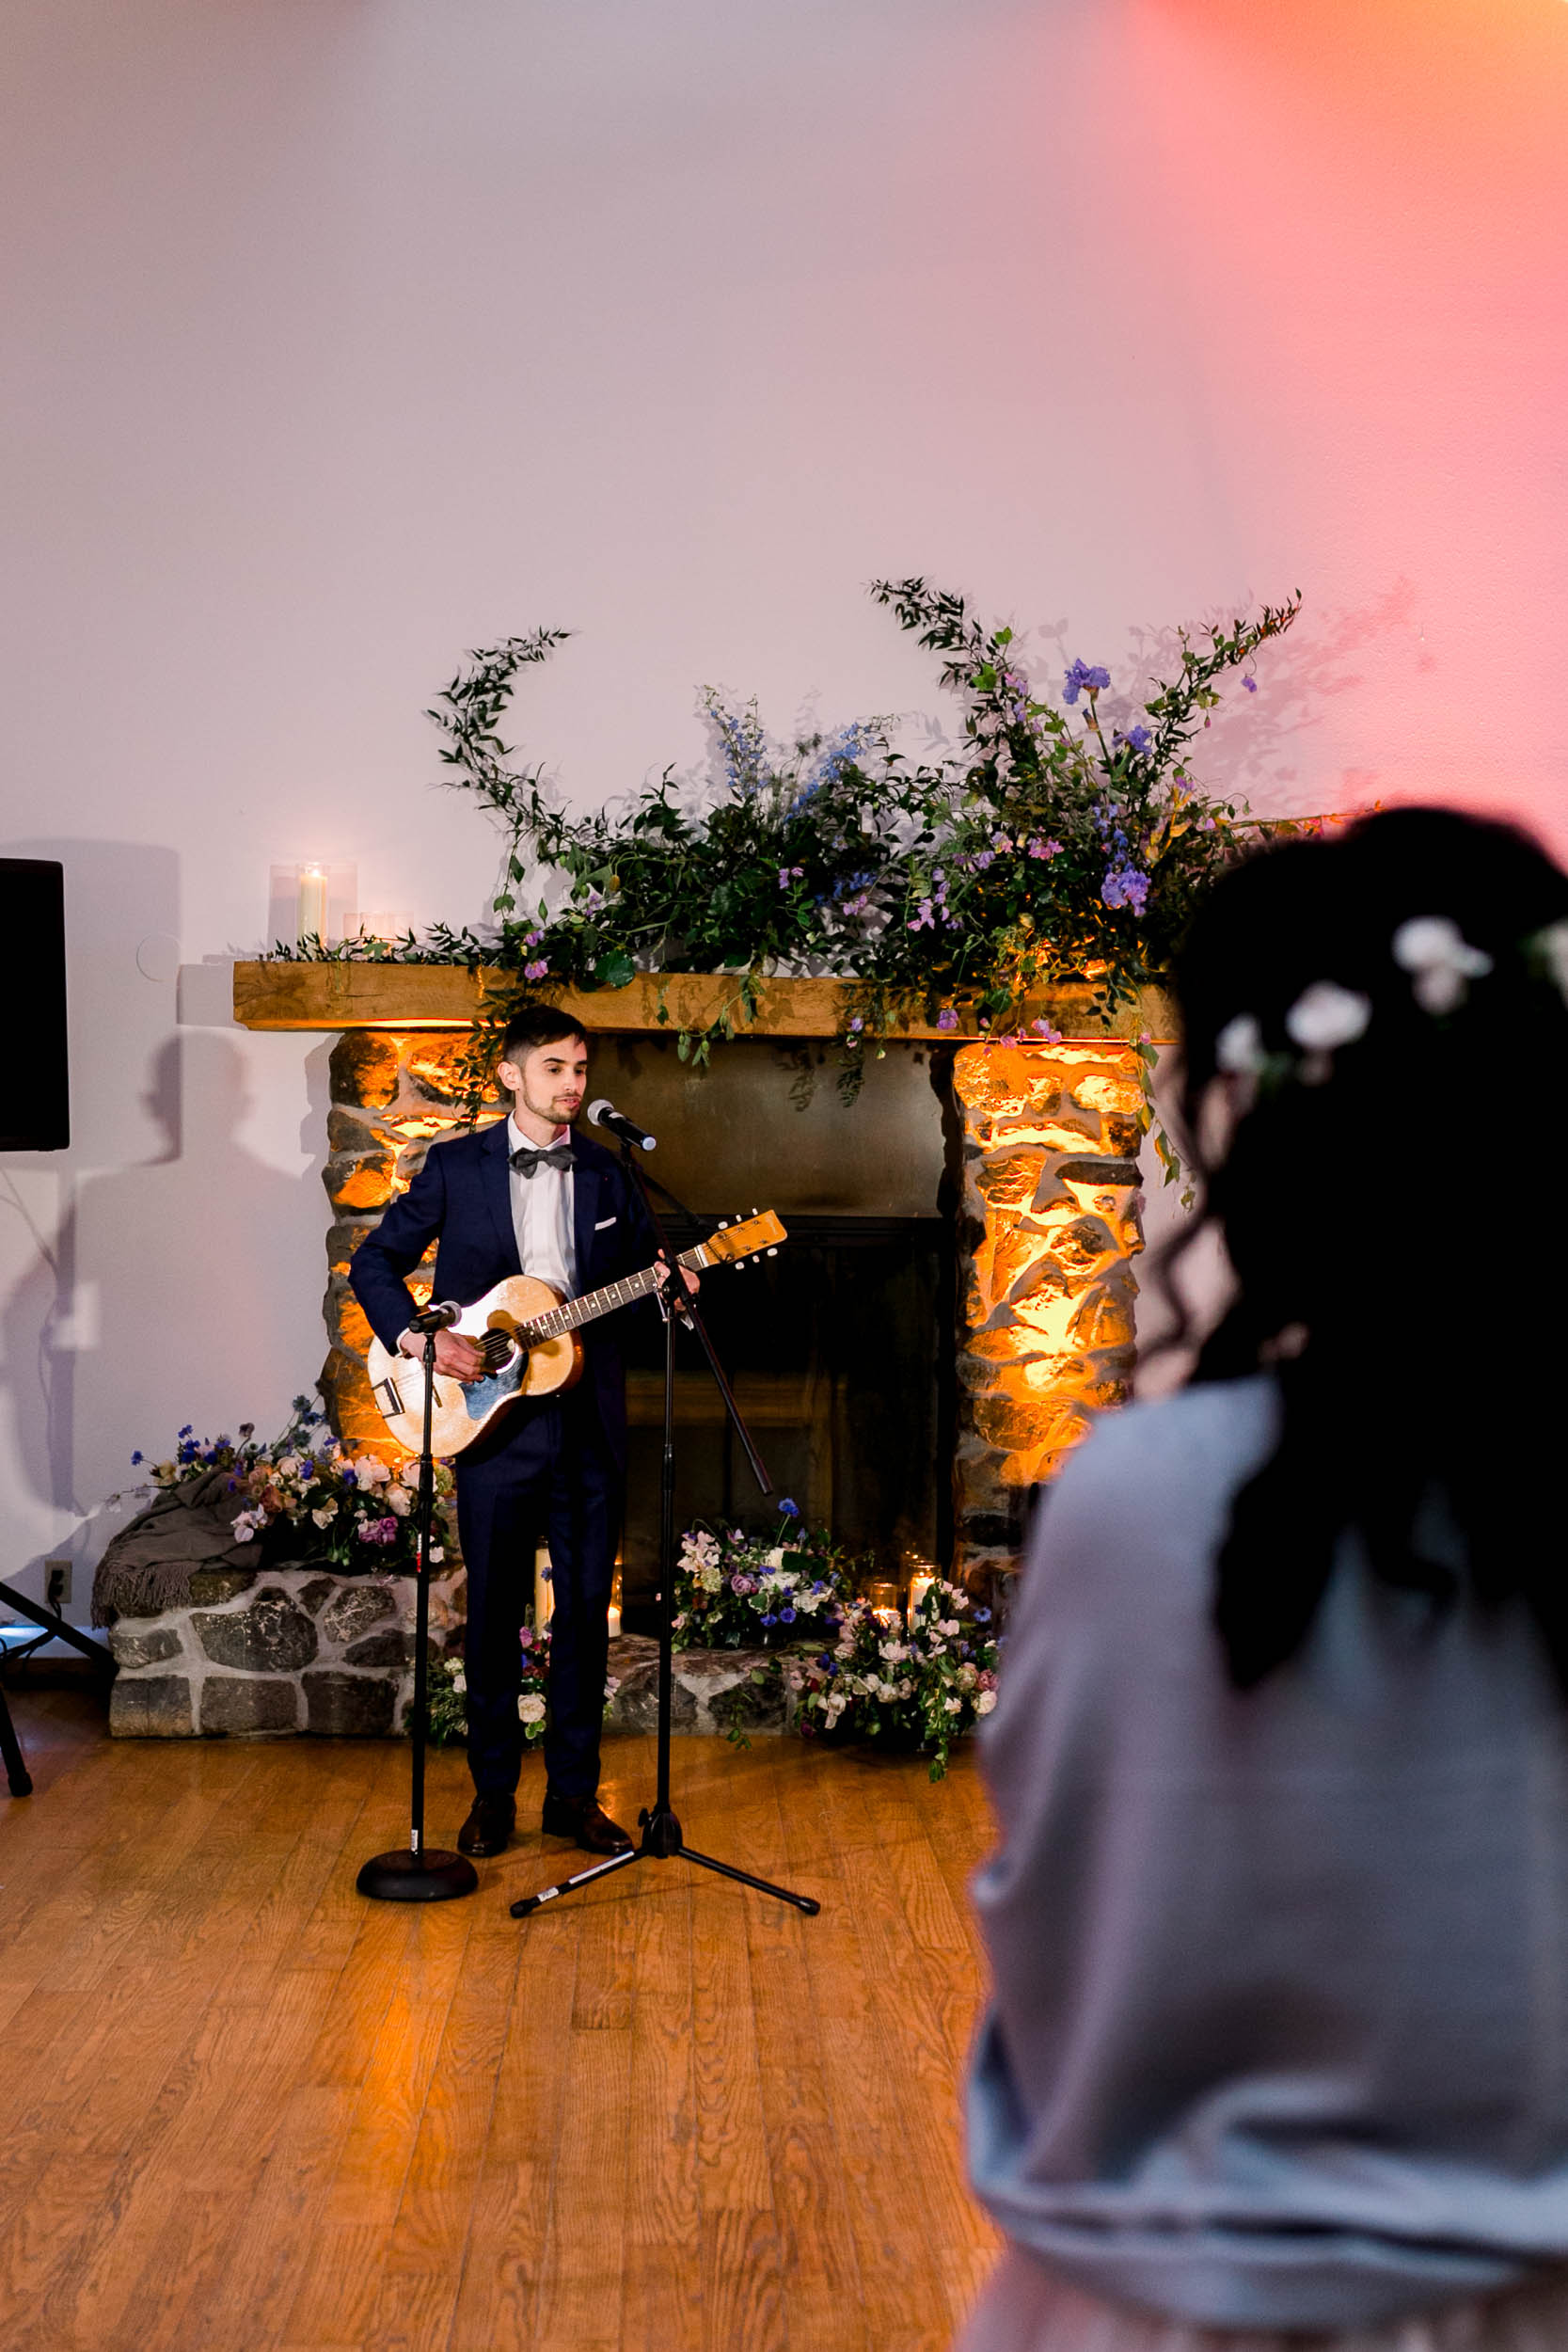 052519_B+S_Hidden Villa Wedding_Buena Lane Photography_052519_0970CY.jpg